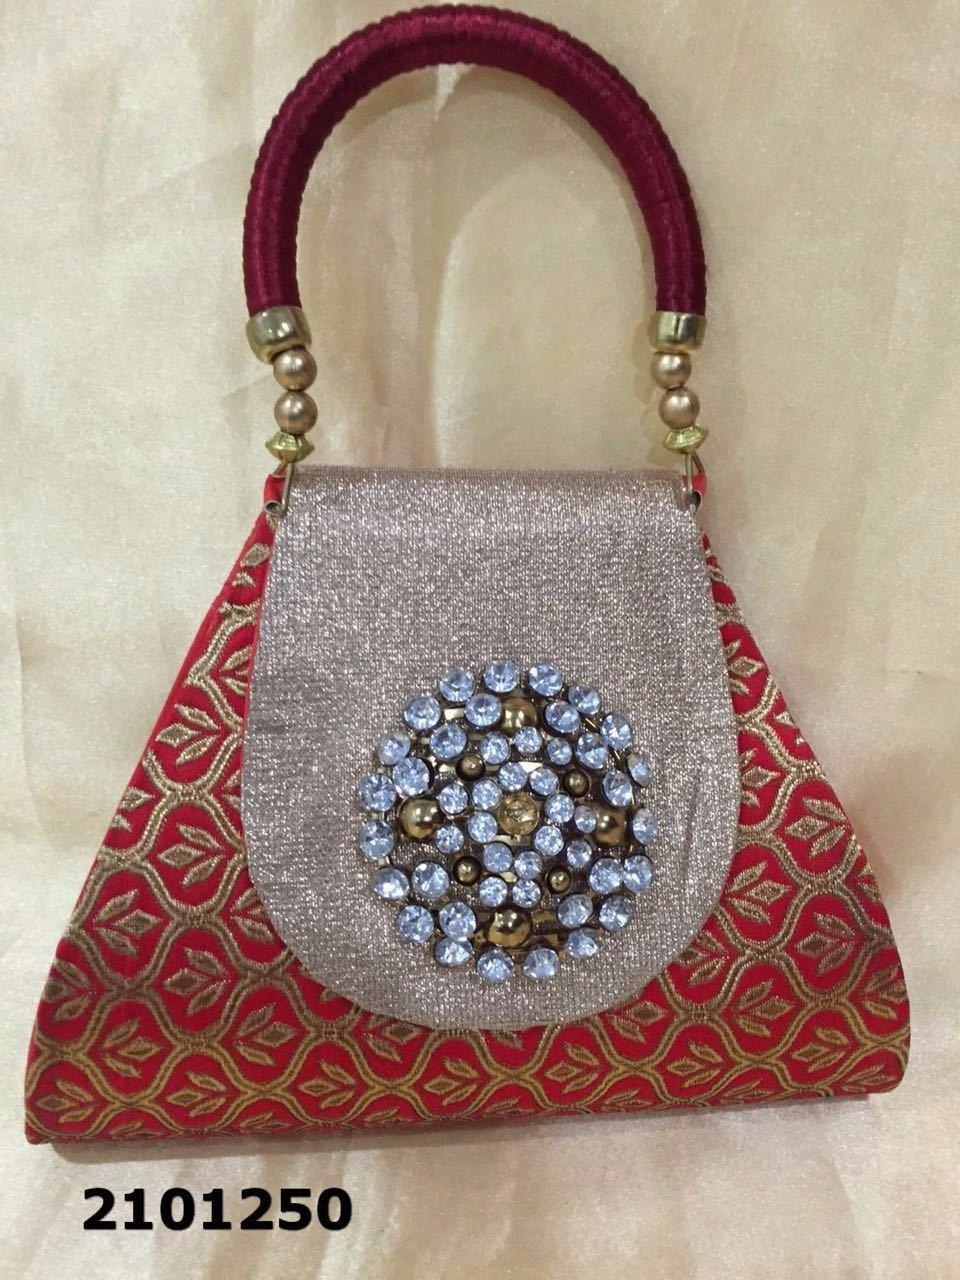 Fashionable And Classy Look Handbag